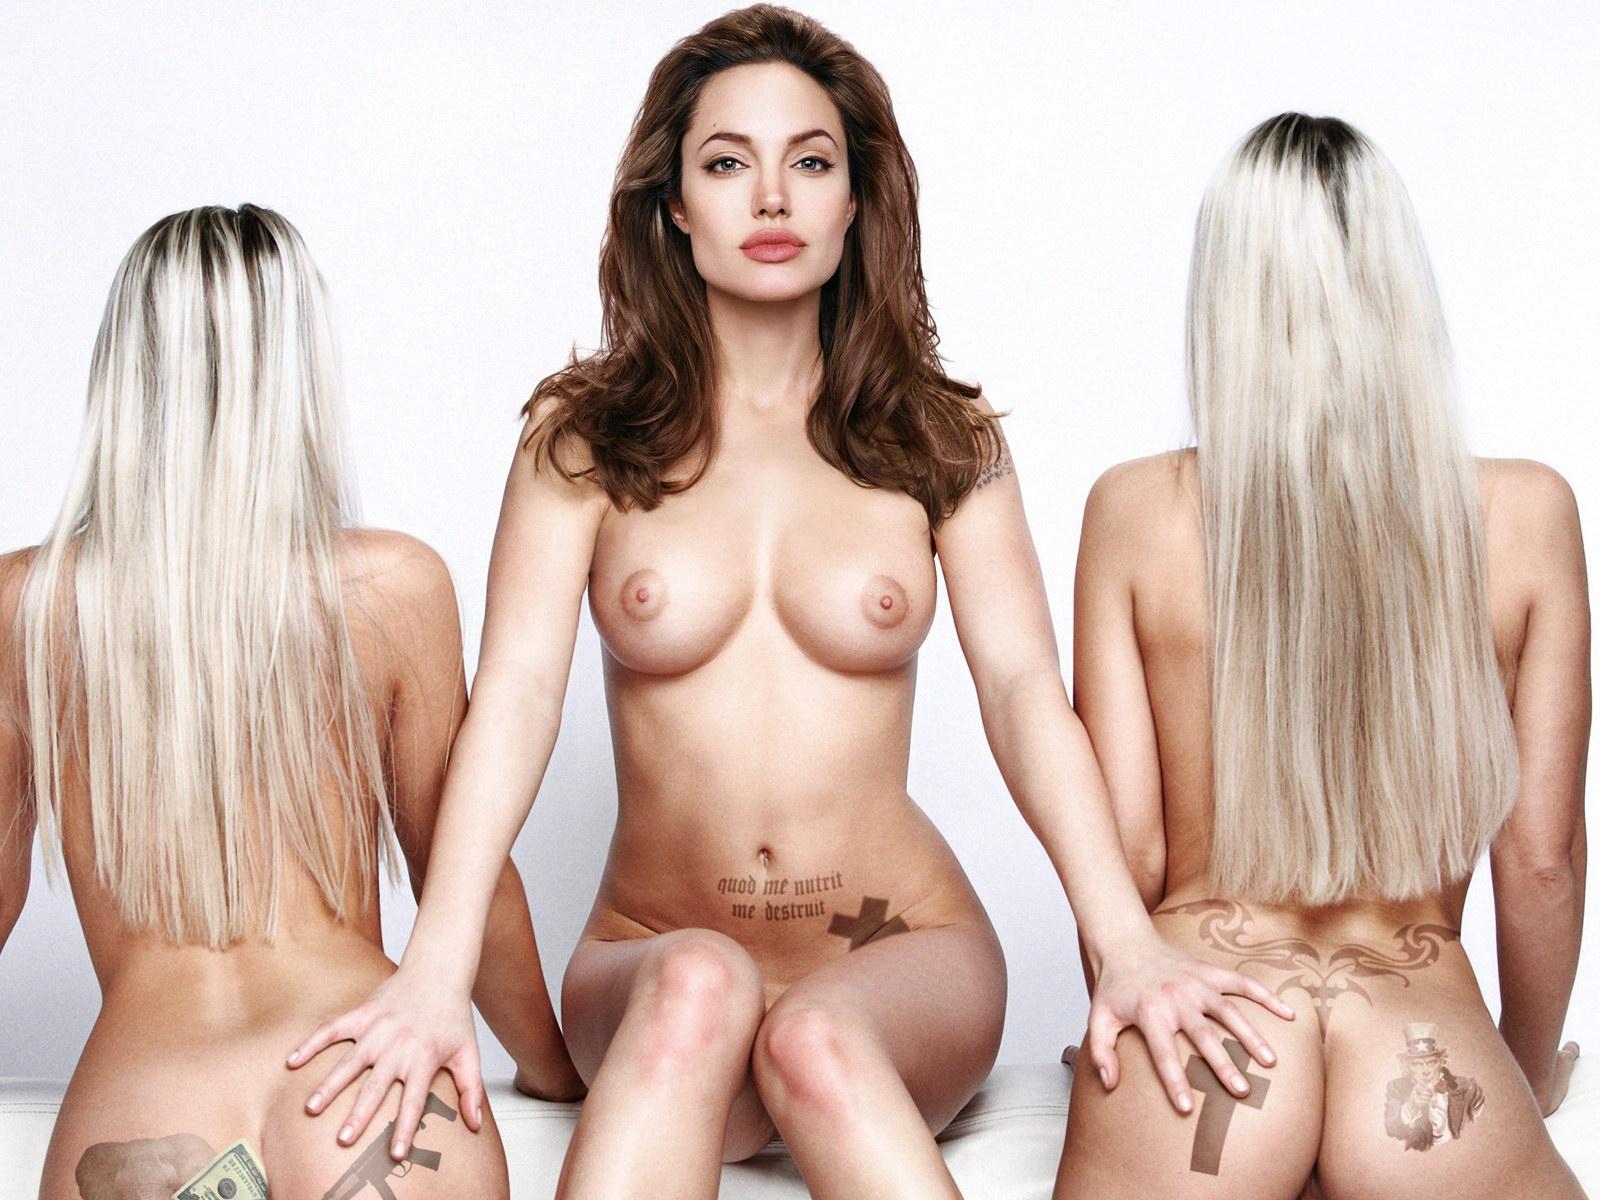 http://1.bp.blogspot.com/-DyiVupcXFok/T41PoFu3jGI/AAAAAAAAAX8/4gDTDTCaQP0/s1600/Angelina+Jolie+nude+on+JOIN+THE+REPUBLICAN+PARTY+poster+UHQ.jpg